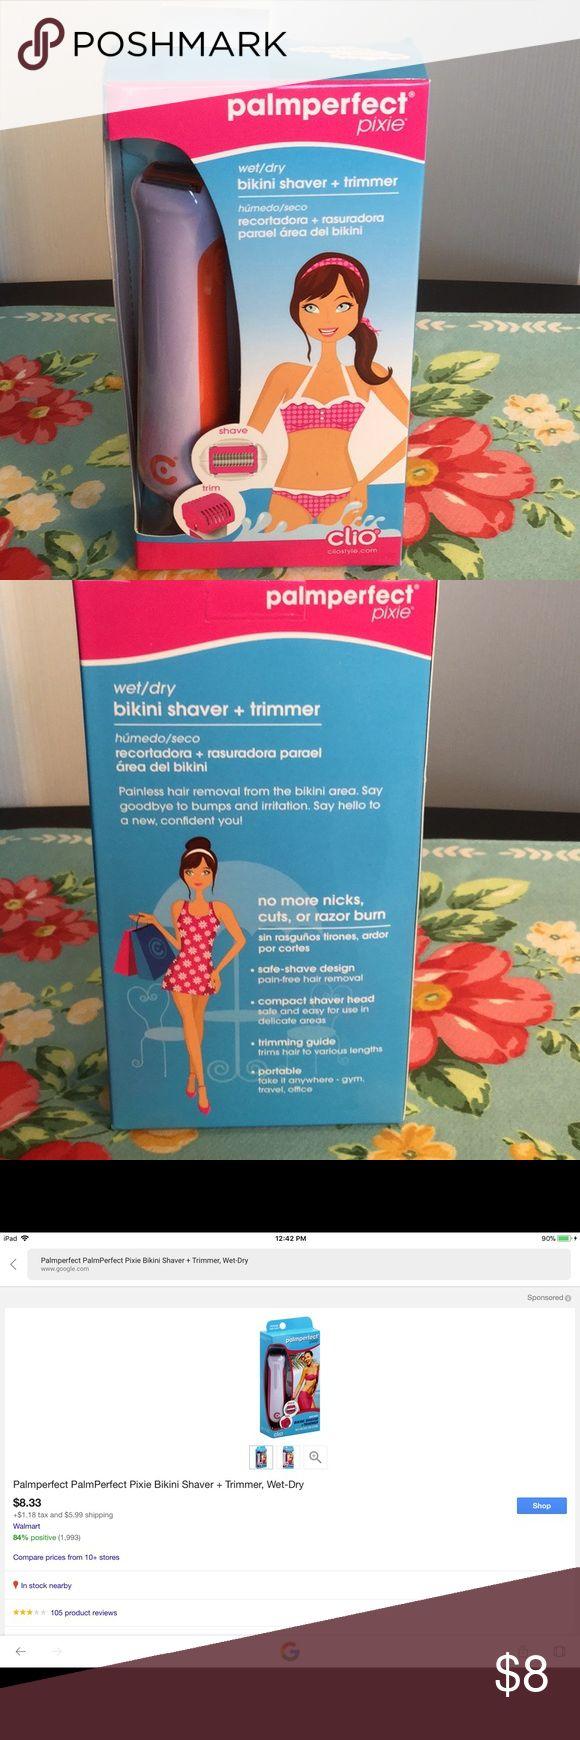 Palmperfect pixie bikini shaver + trimmer Brand new Accessories